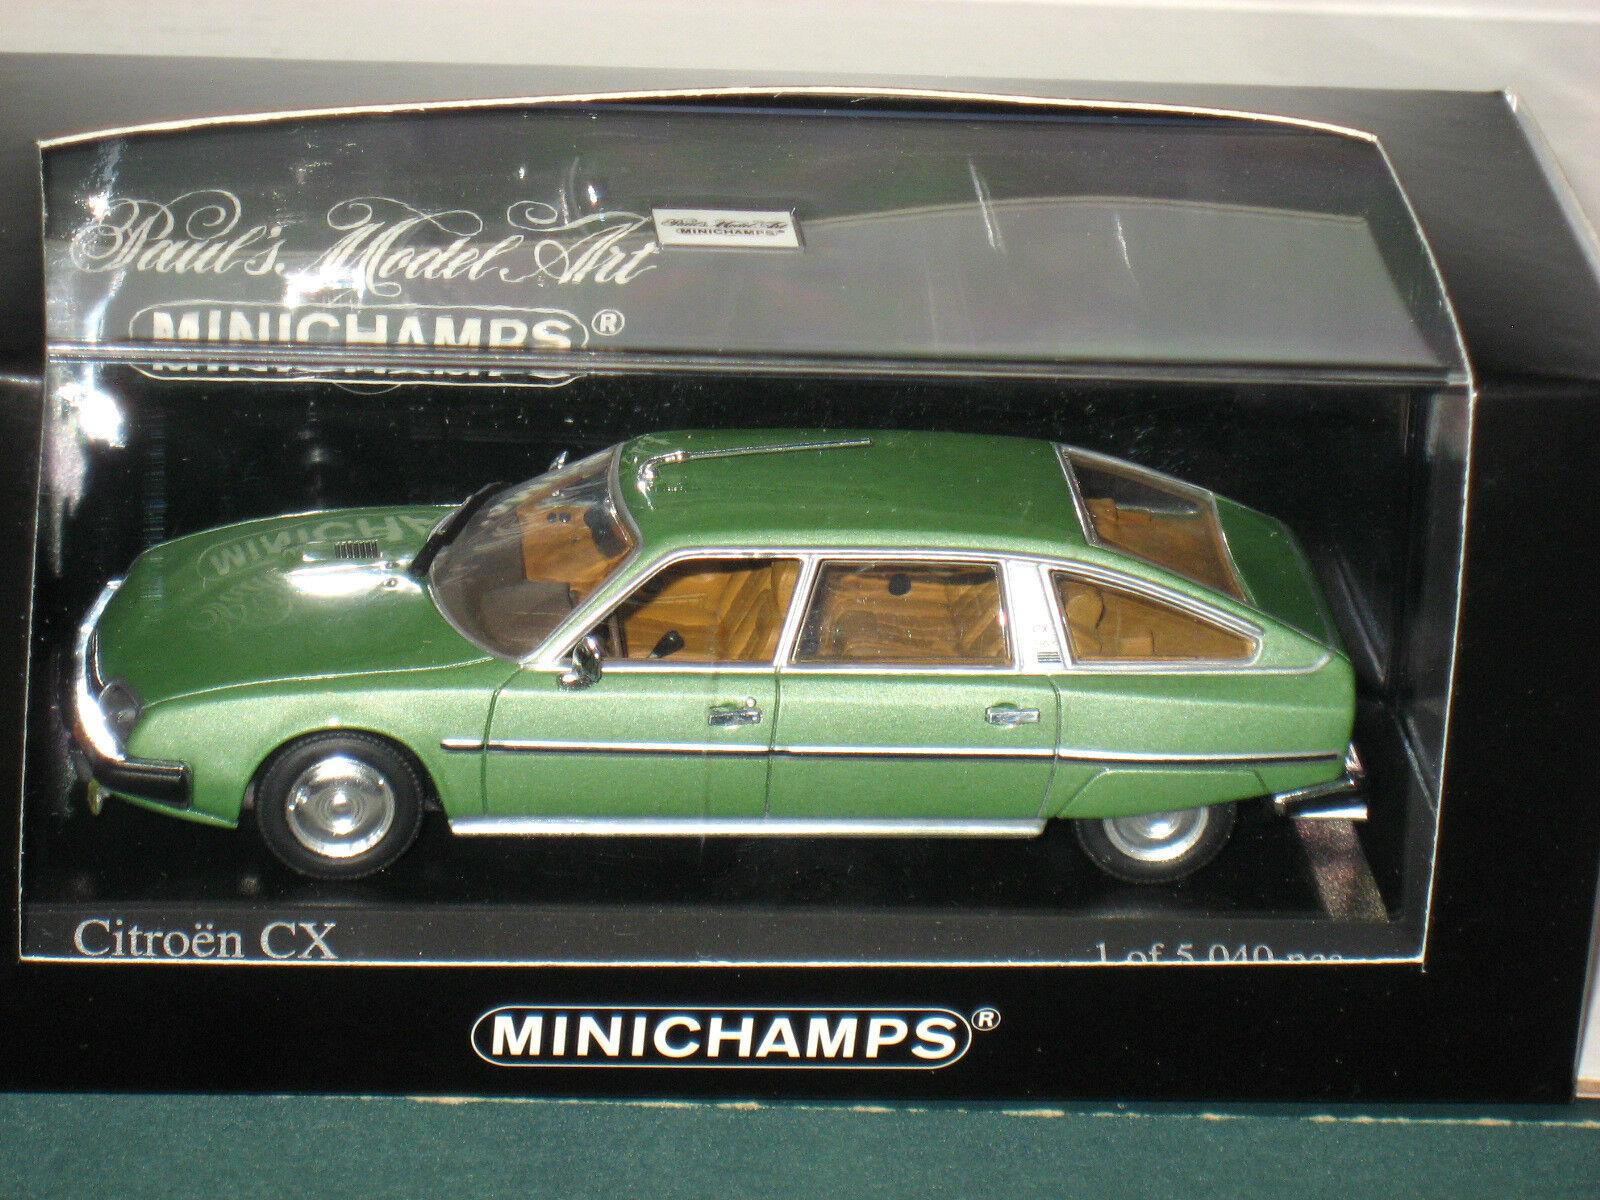 Minichamps 1982 Citroen CX Prestige Diecast 1 43 Limited Edition Metallic Green